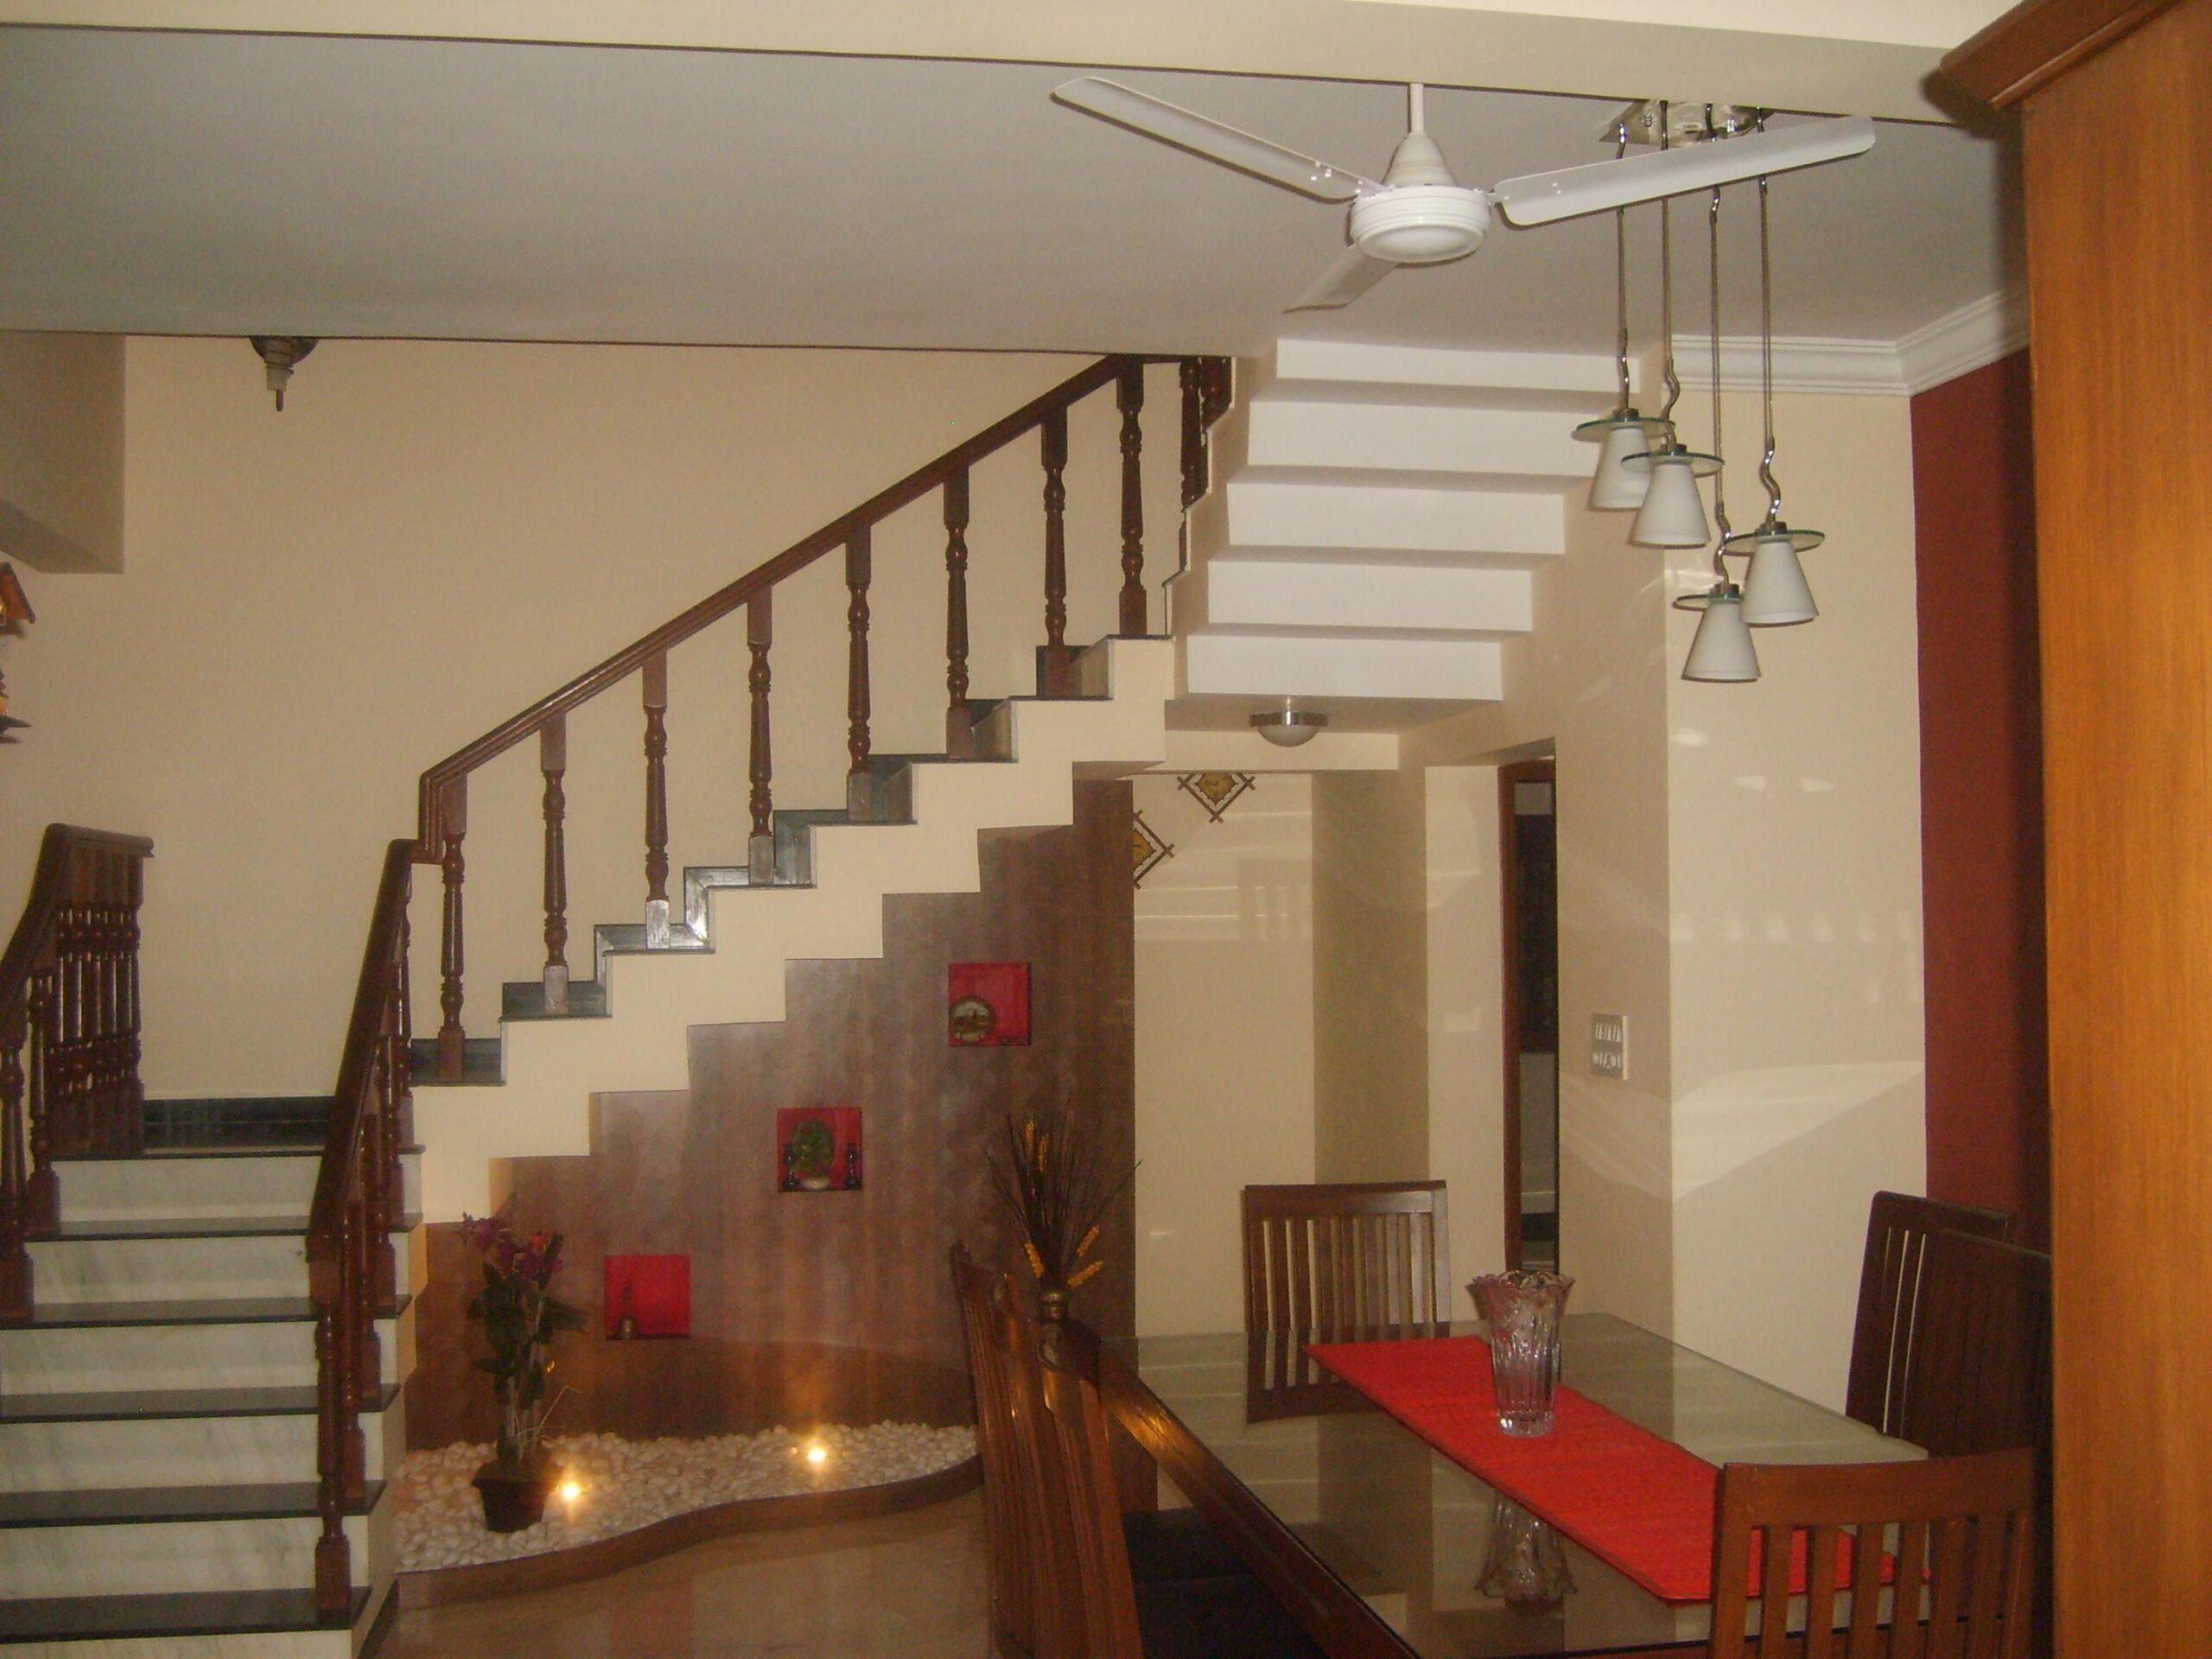 3 bhk Duplex Apartment for sale in Punkunnam, Thrissur.